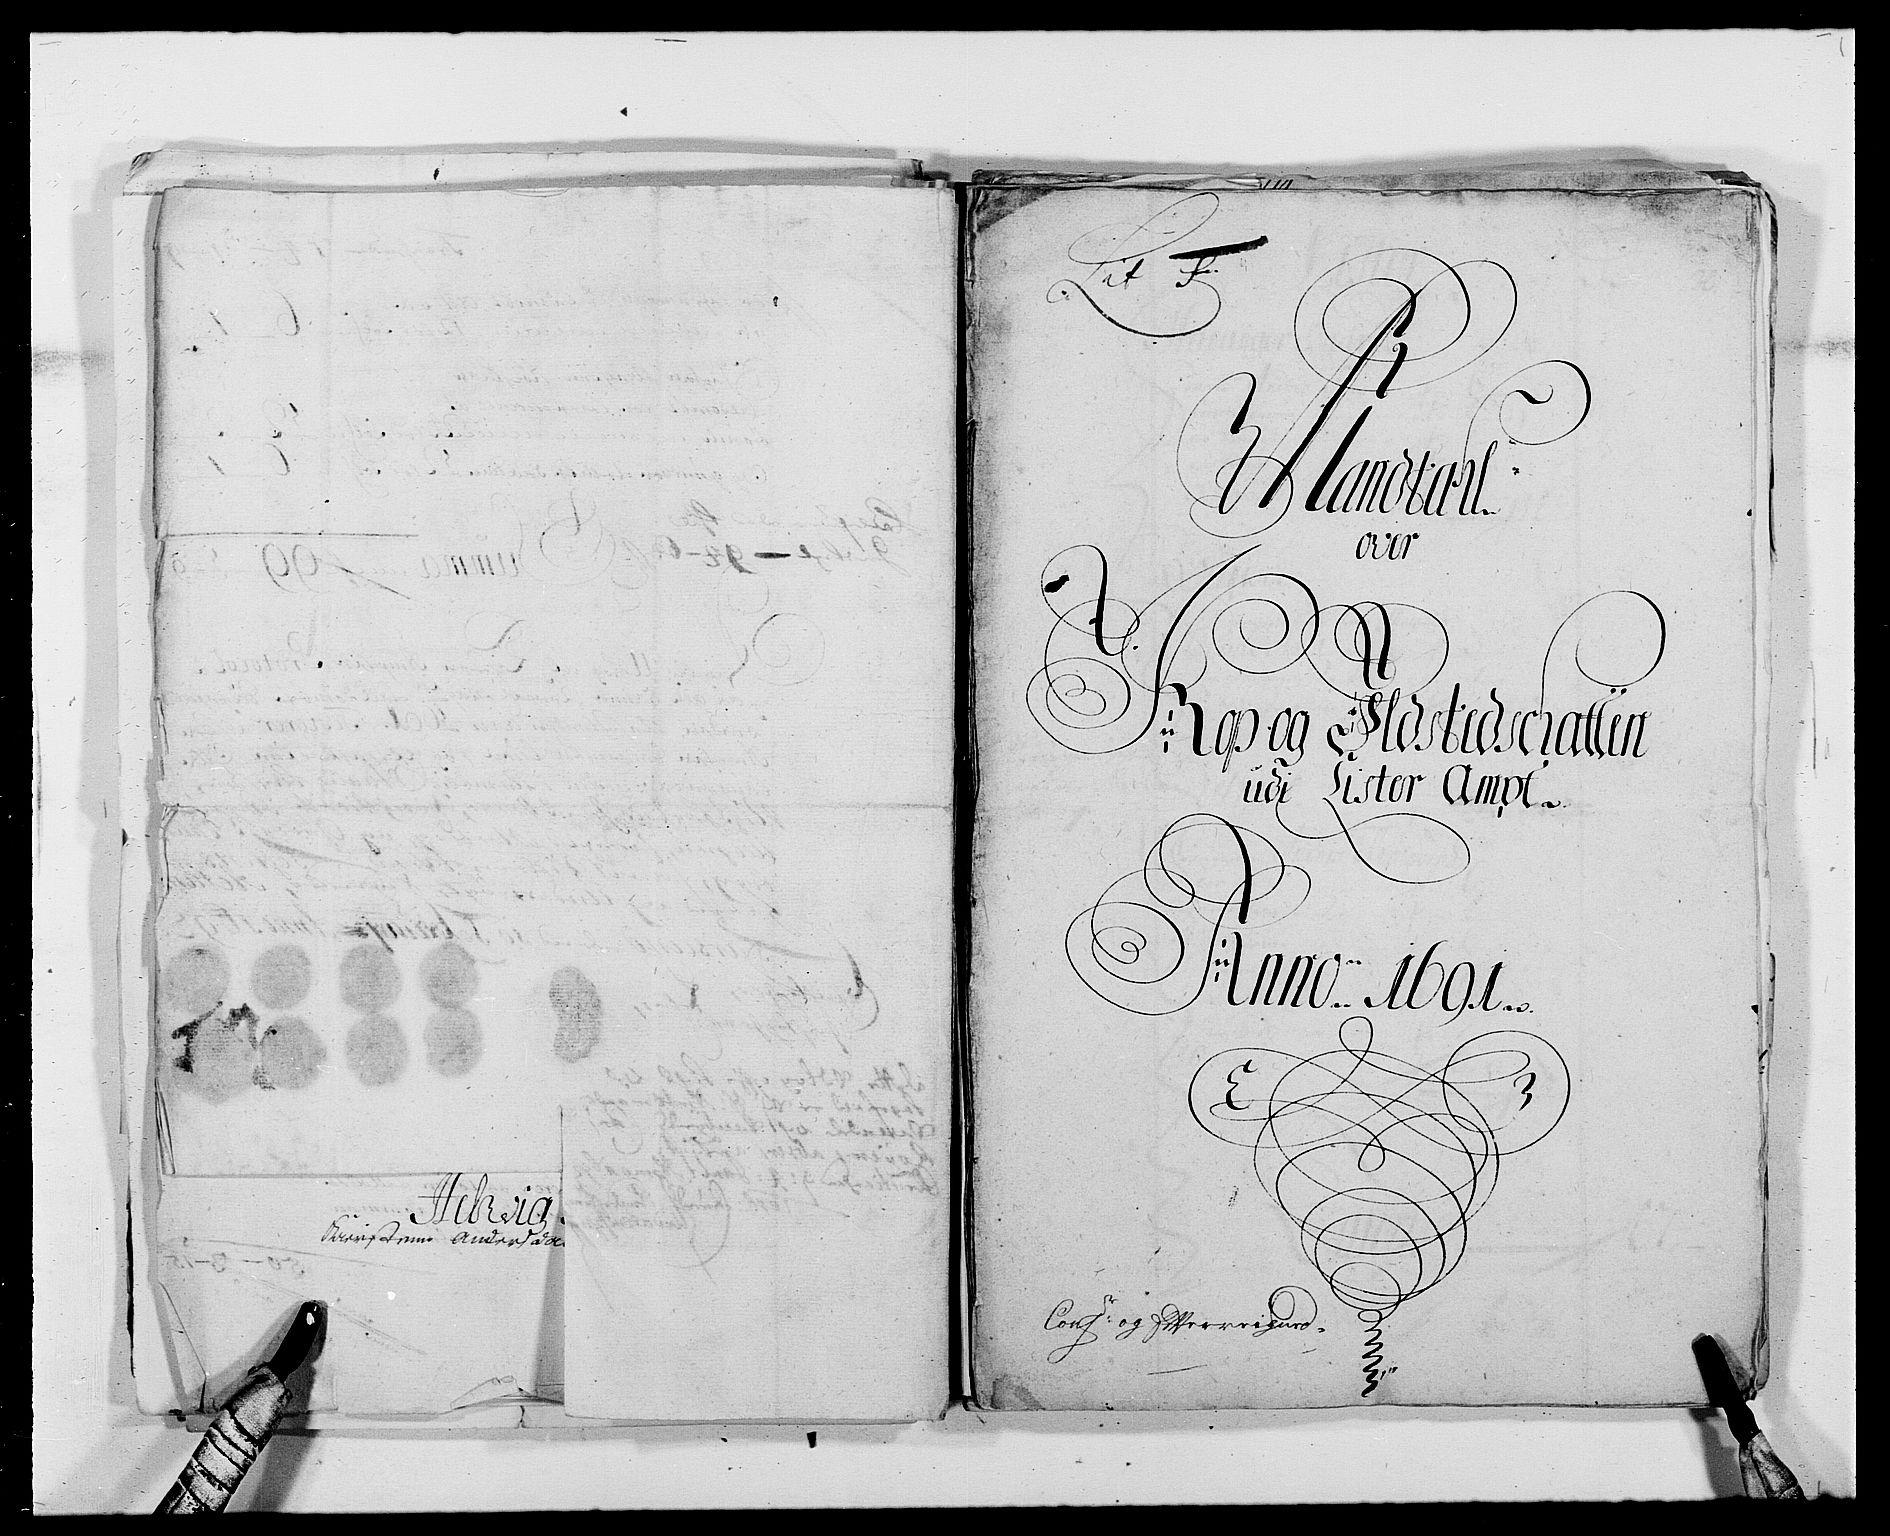 RA, Rentekammeret inntil 1814, Reviderte regnskaper, Fogderegnskap, R41/L2536: Fogderegnskap Lista, 1690-1693, s. 145